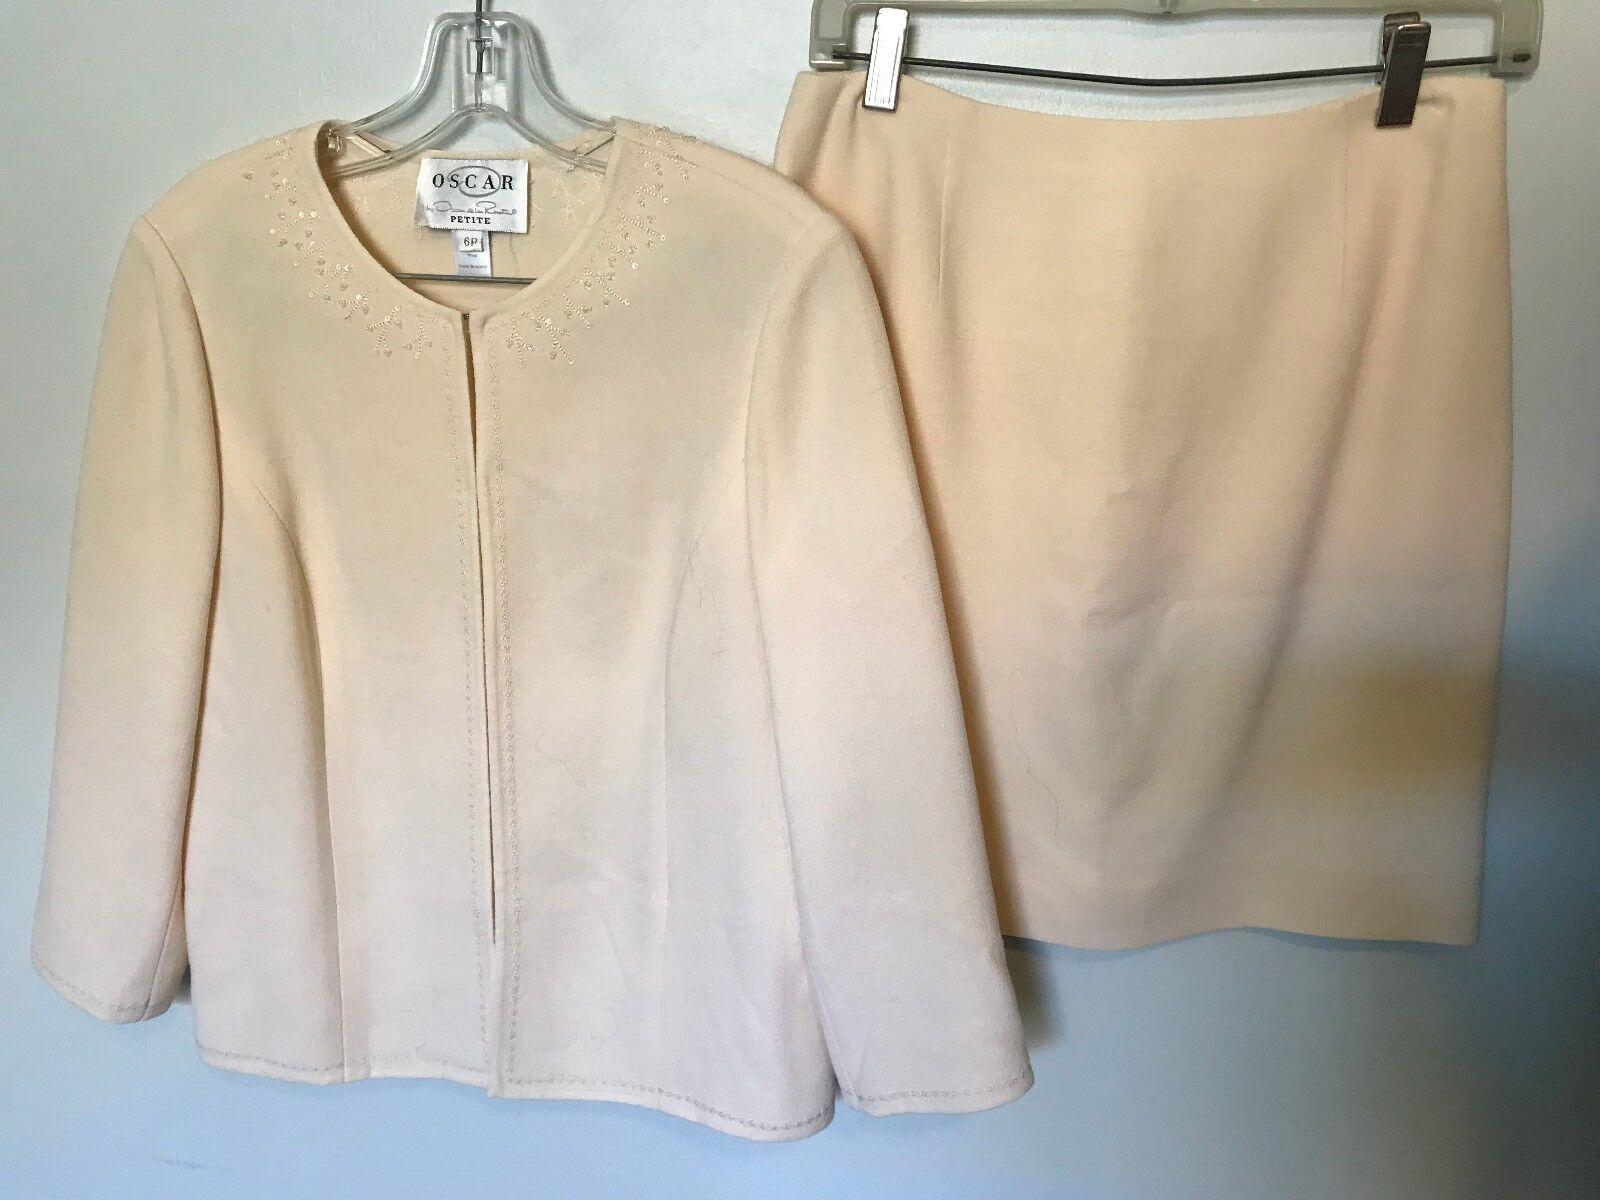 Oscar de la Renta Ivory Evening Skirt Suit - Size Petite S